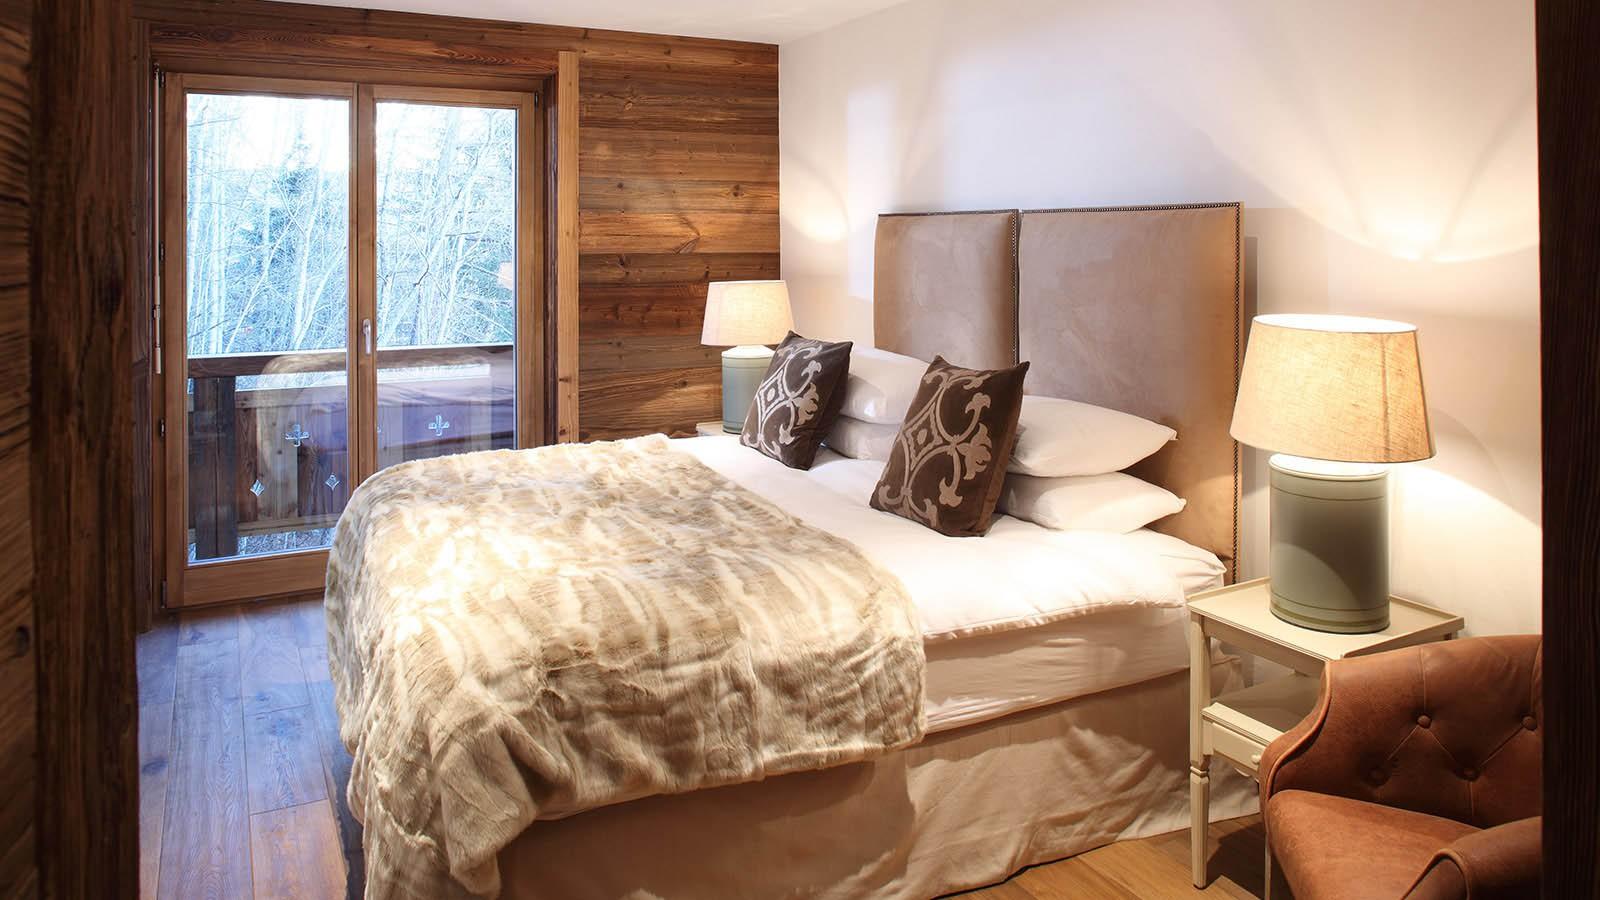 Double room in chalet Rosablanche, Nendaz